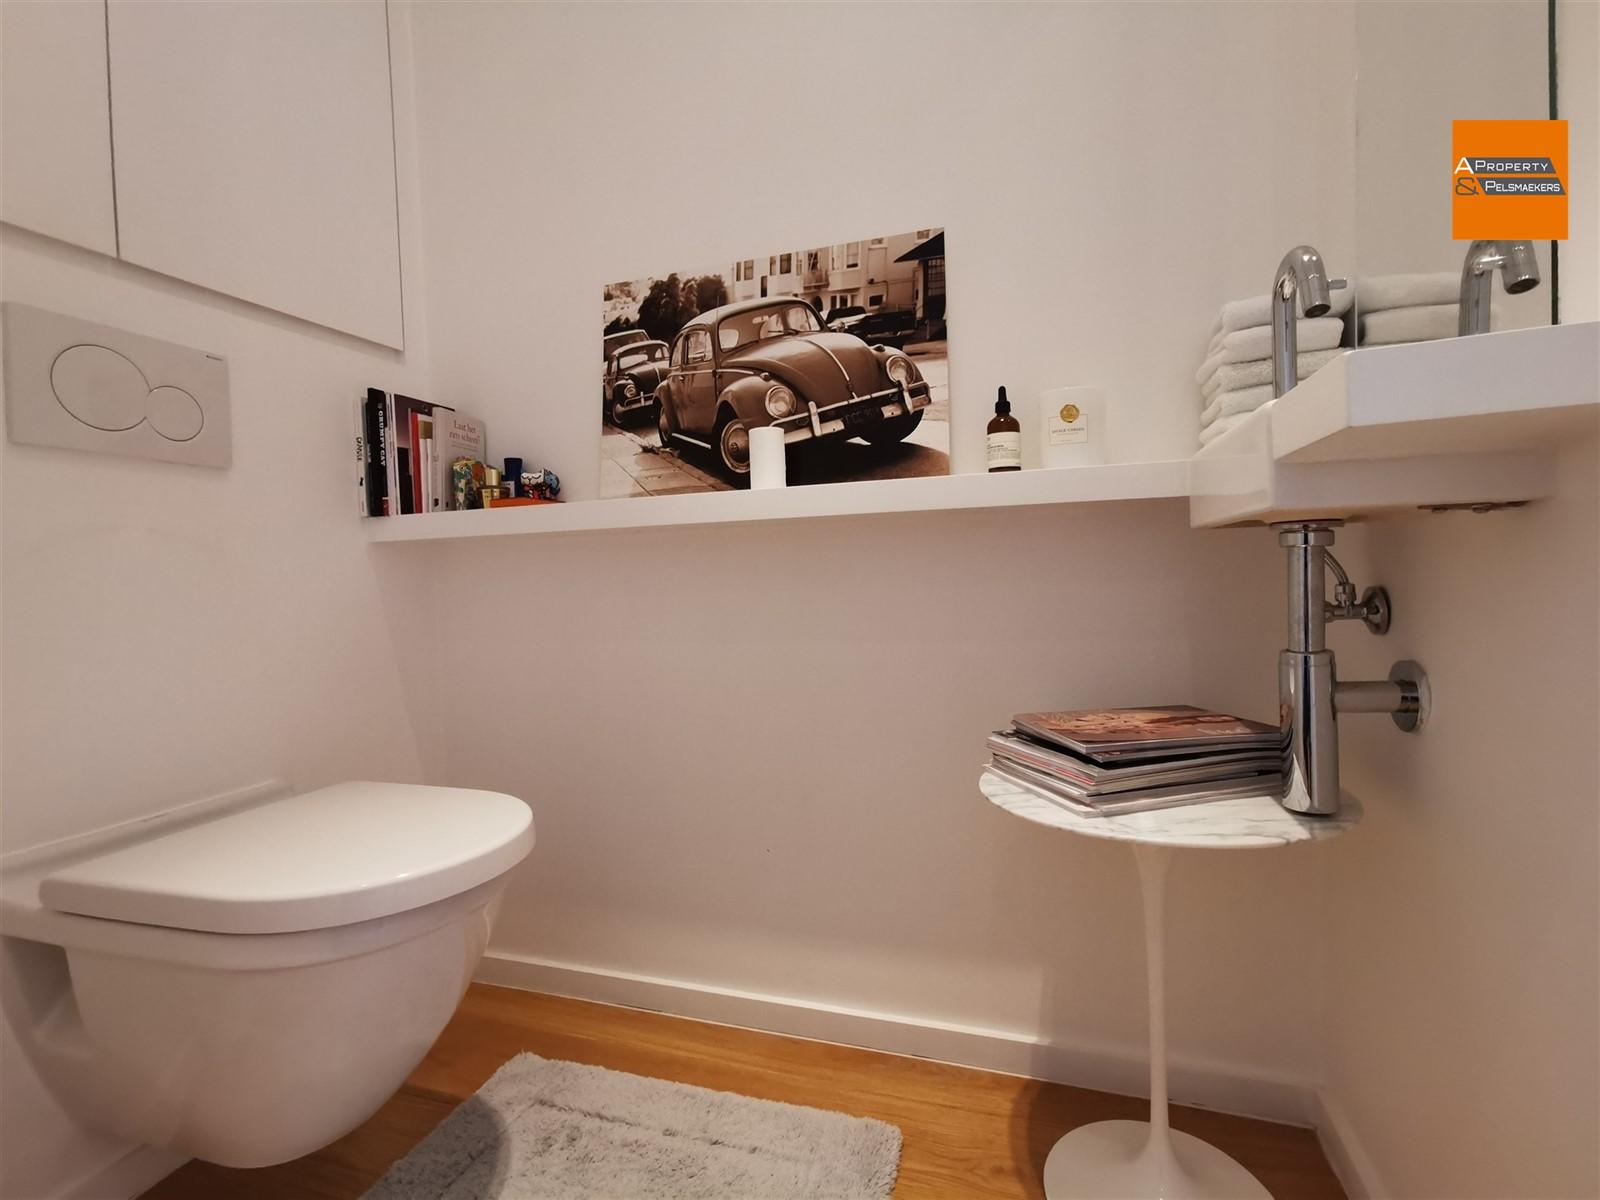 Foto 11 : Gemeubeld appartement in 1050 ELSENE (België) - Prijs € 1.500